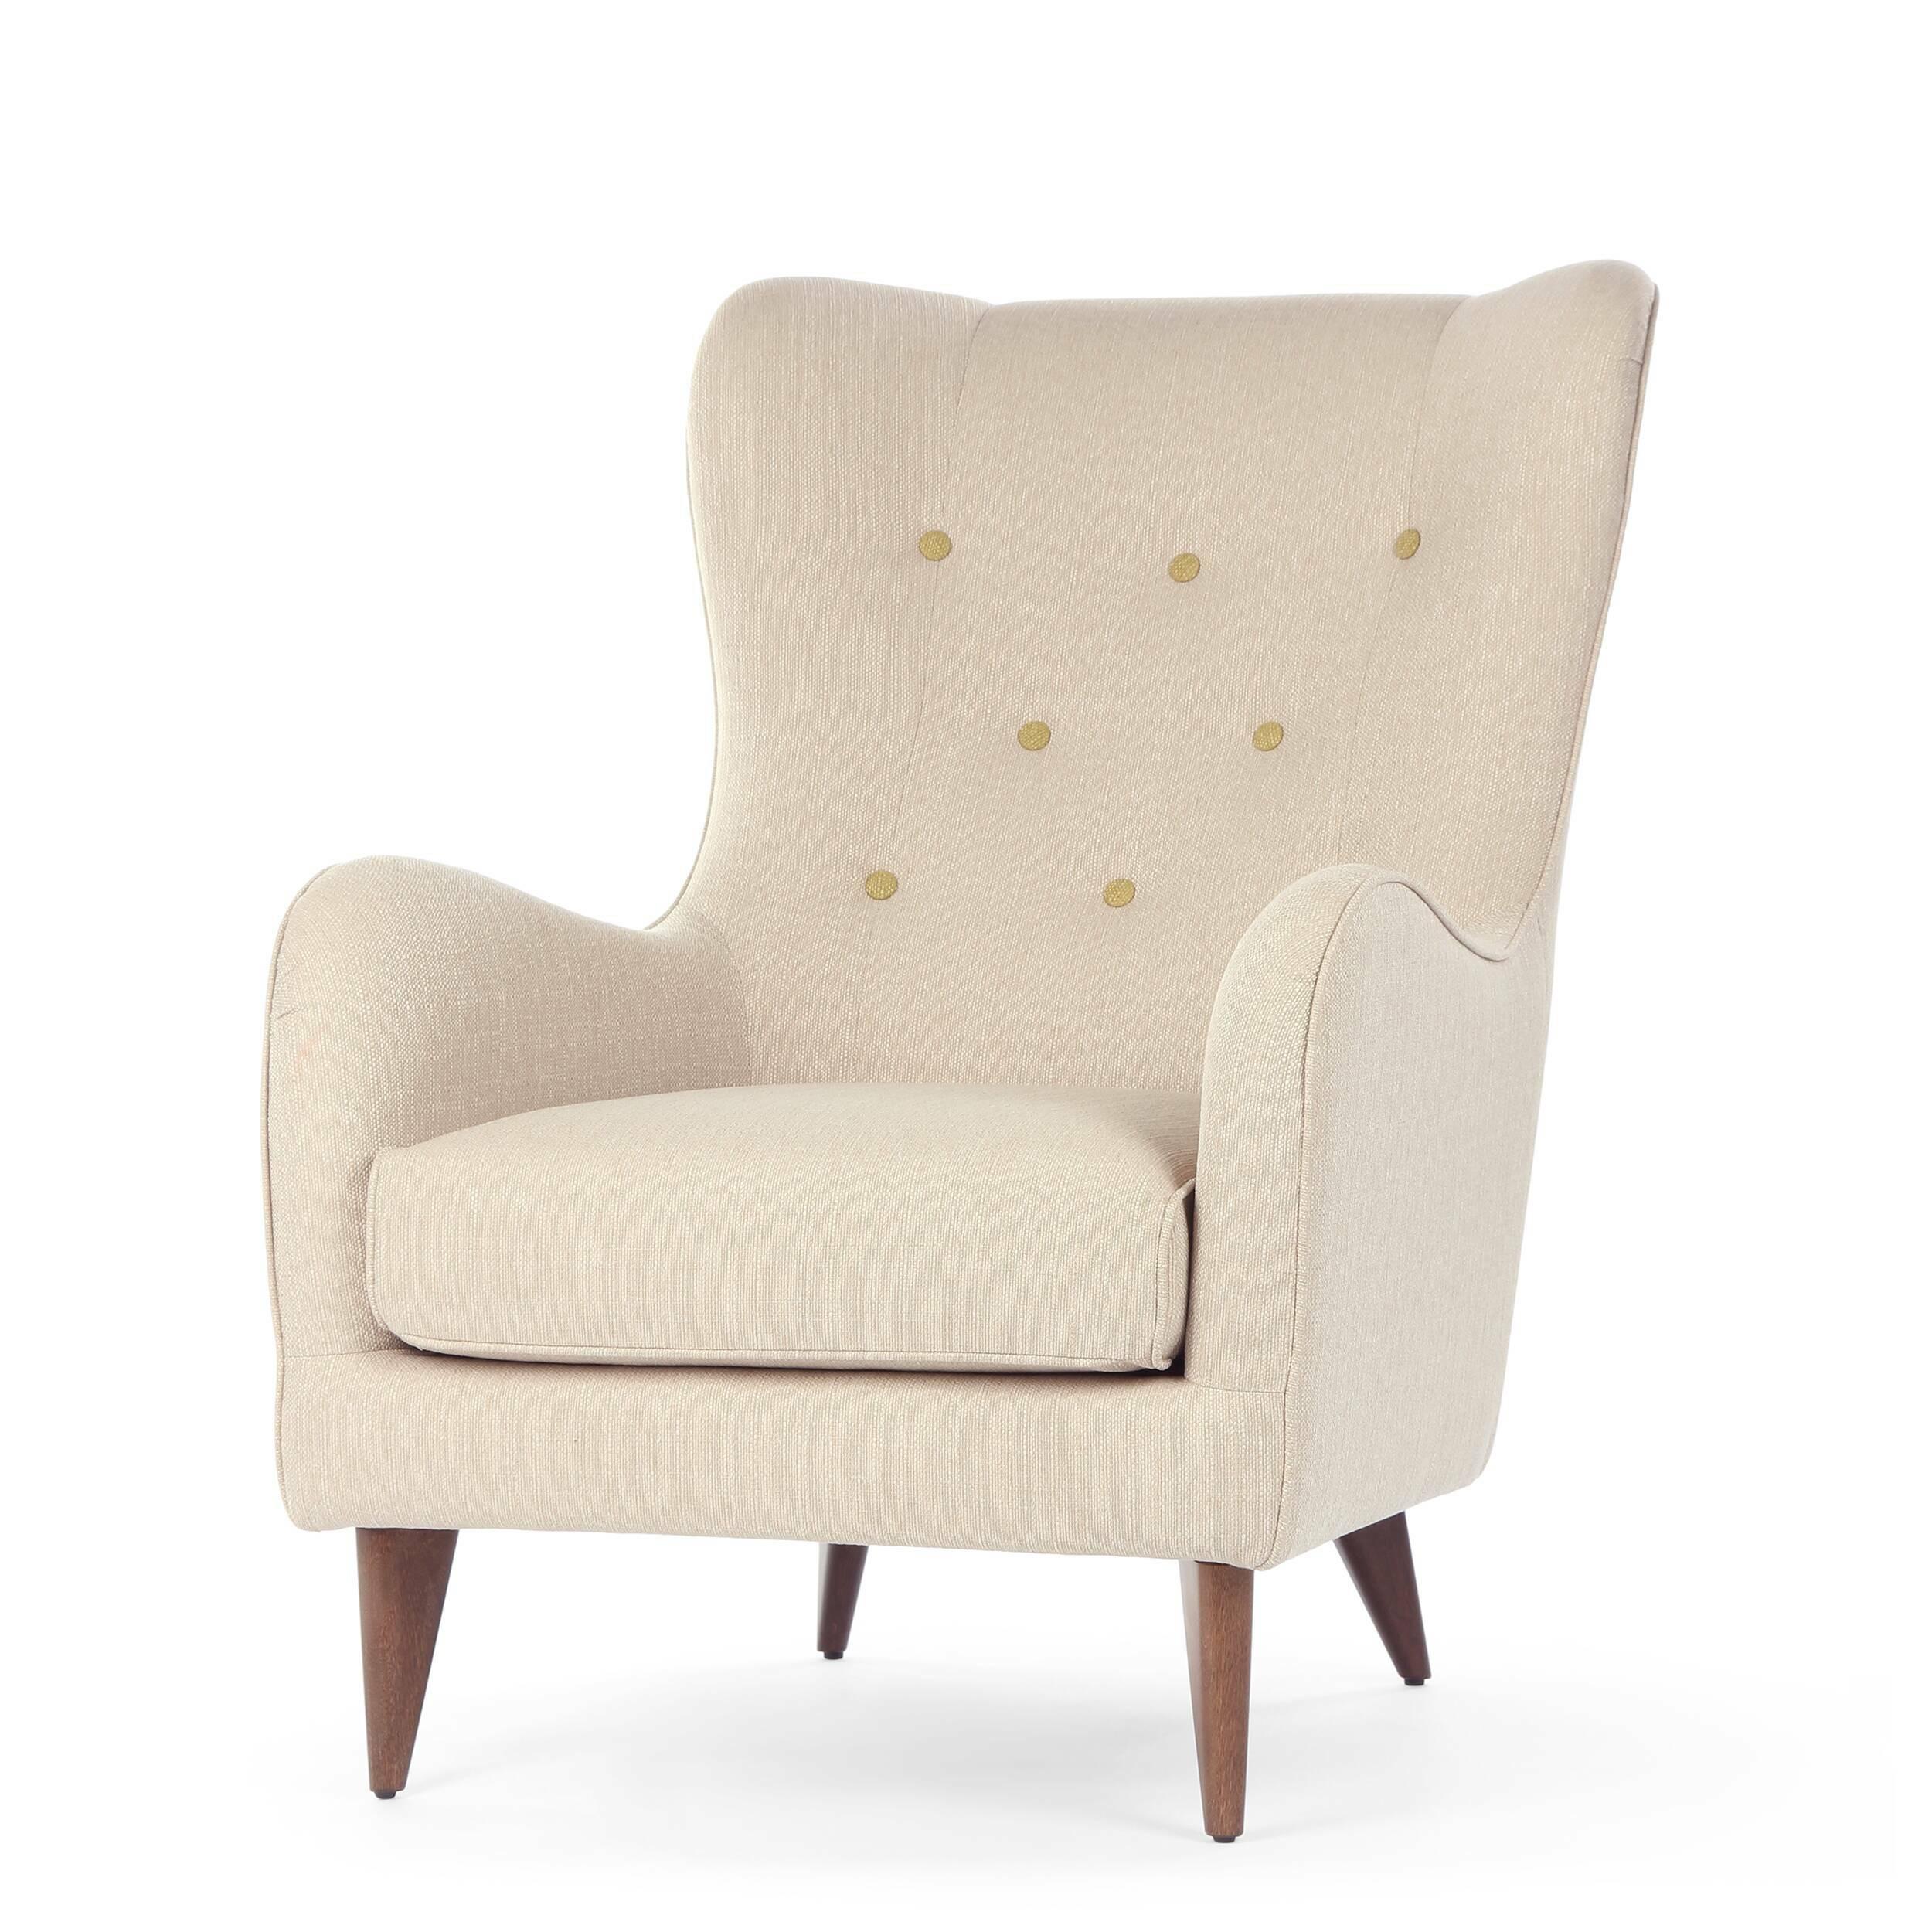 Кресло Pola sits кресло pola